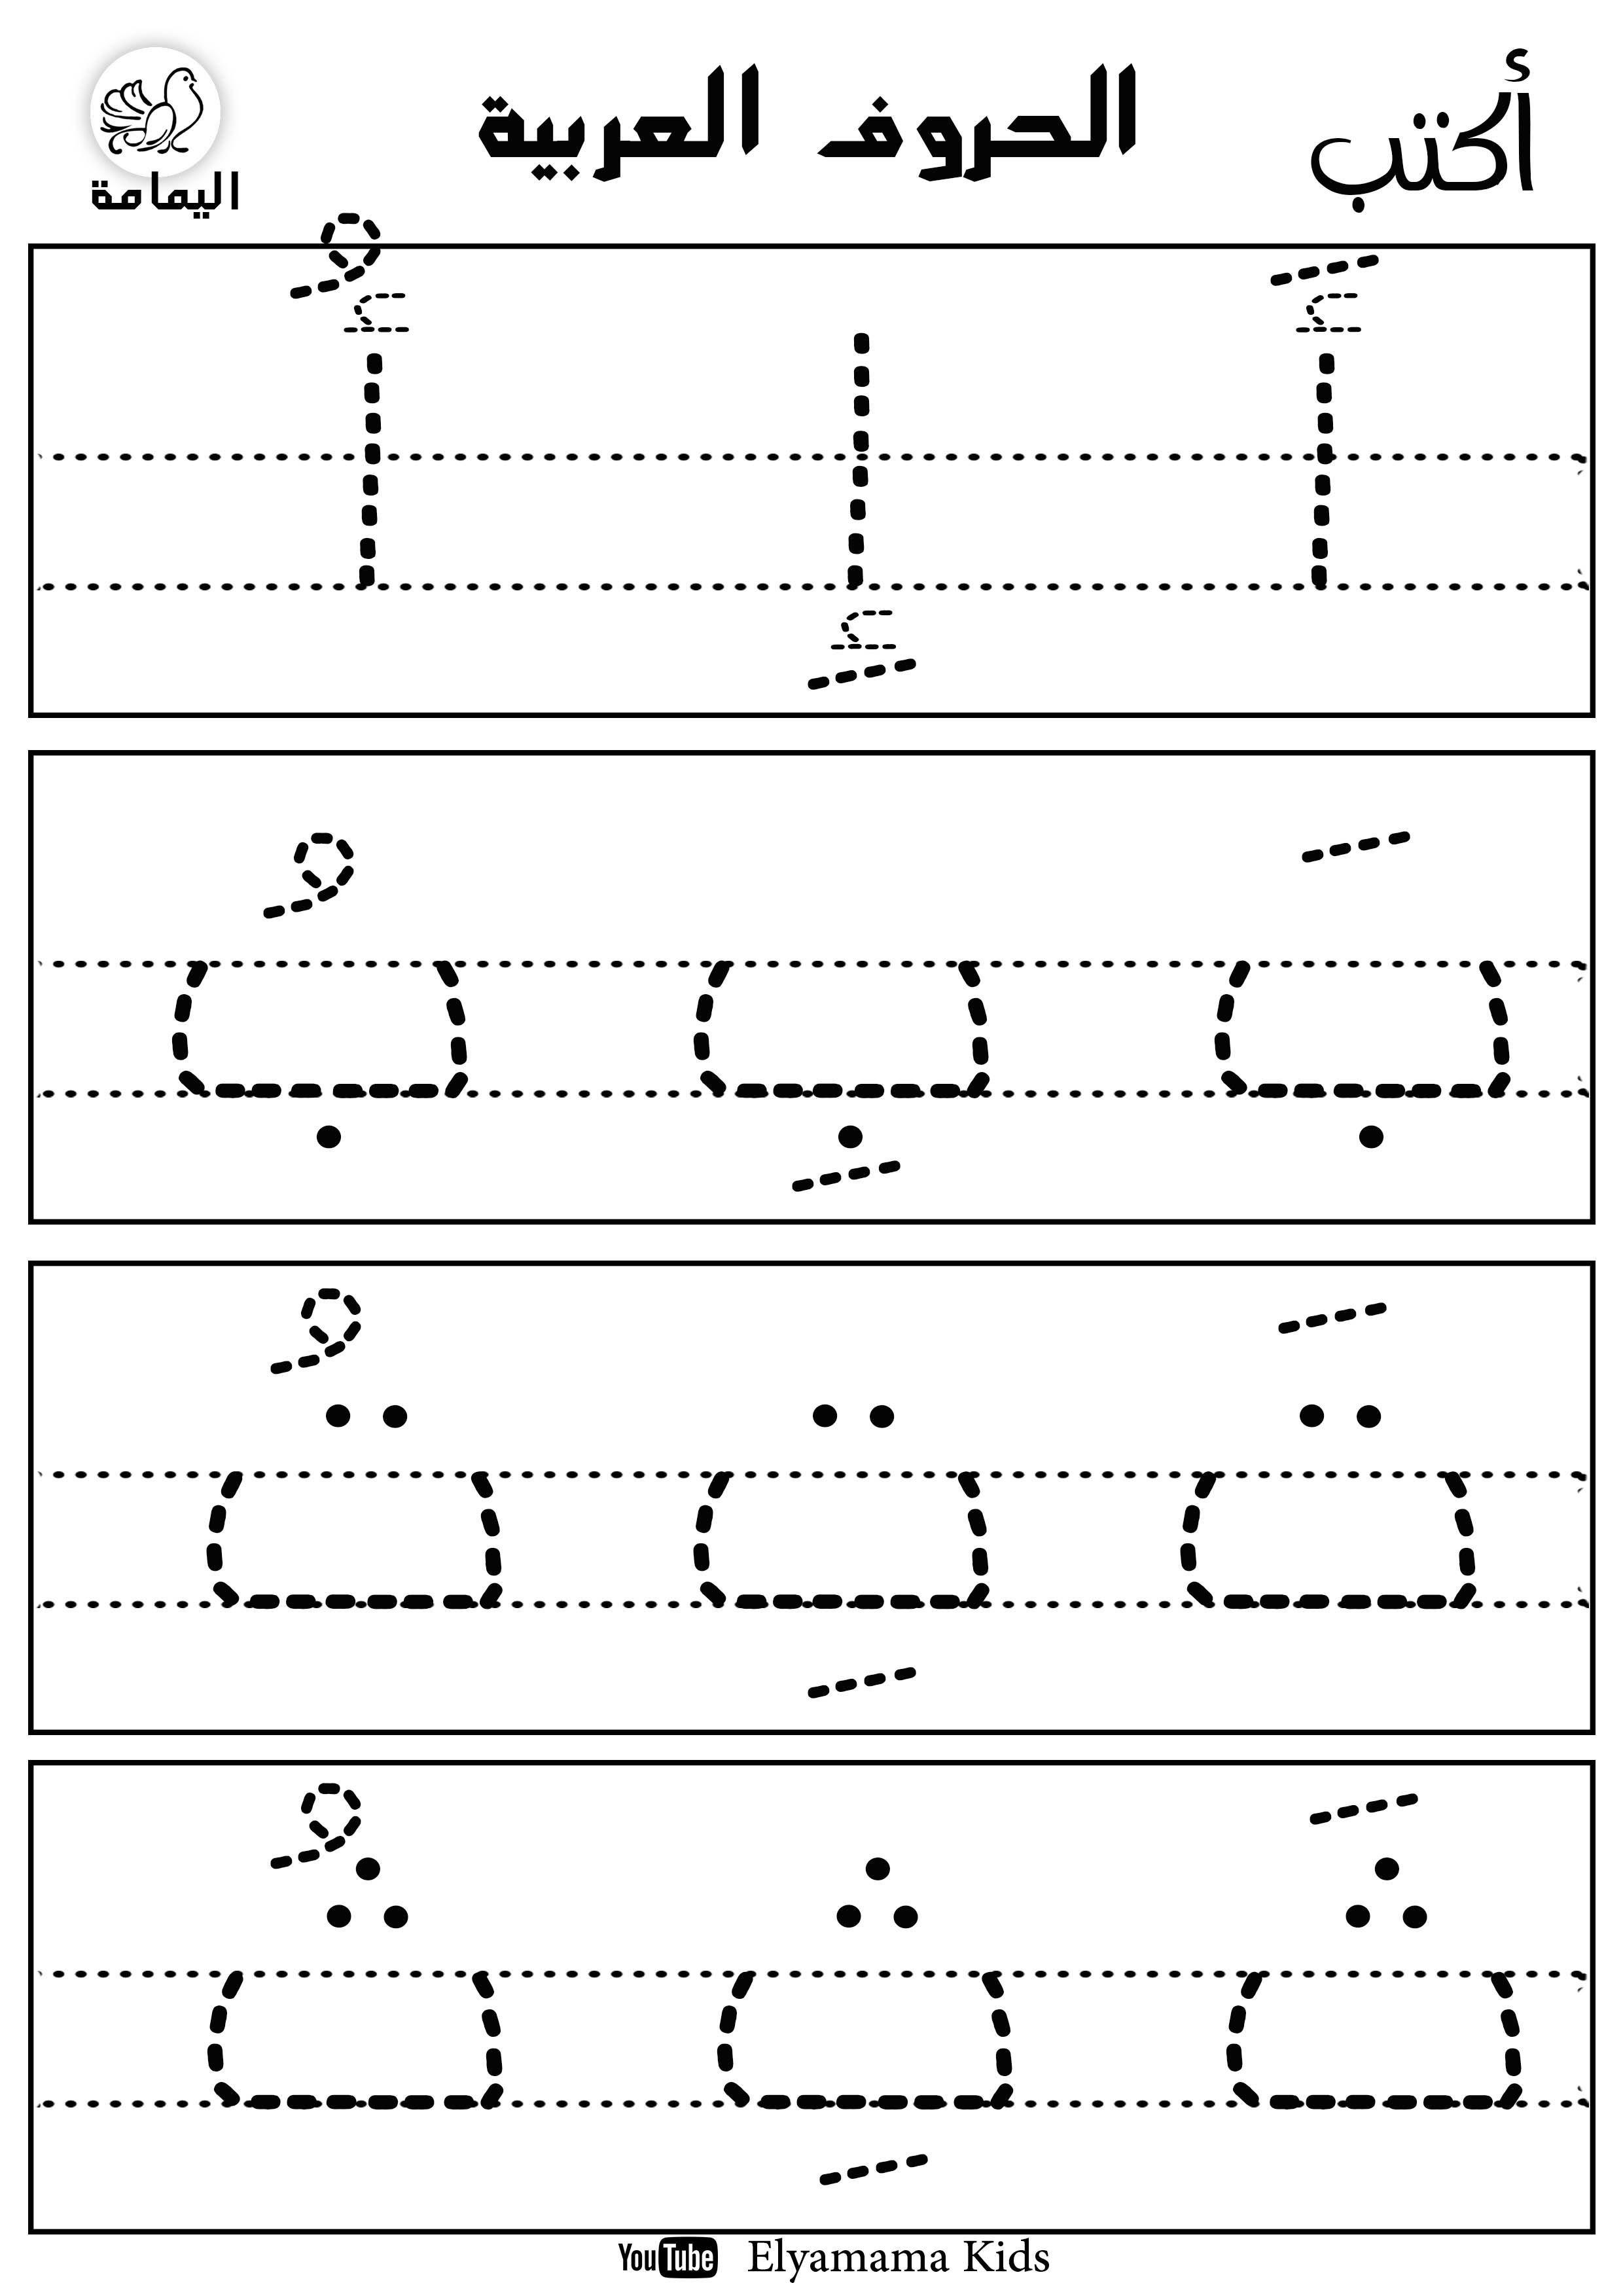 Arabic Teachers Ponnani Work Sheets For Lp Arabic By باء استراتيجيات تعليم أطفال أطفال الروضة Arabic Alphabet Letters Arabic Handwriting Learn Arabic Alphabet